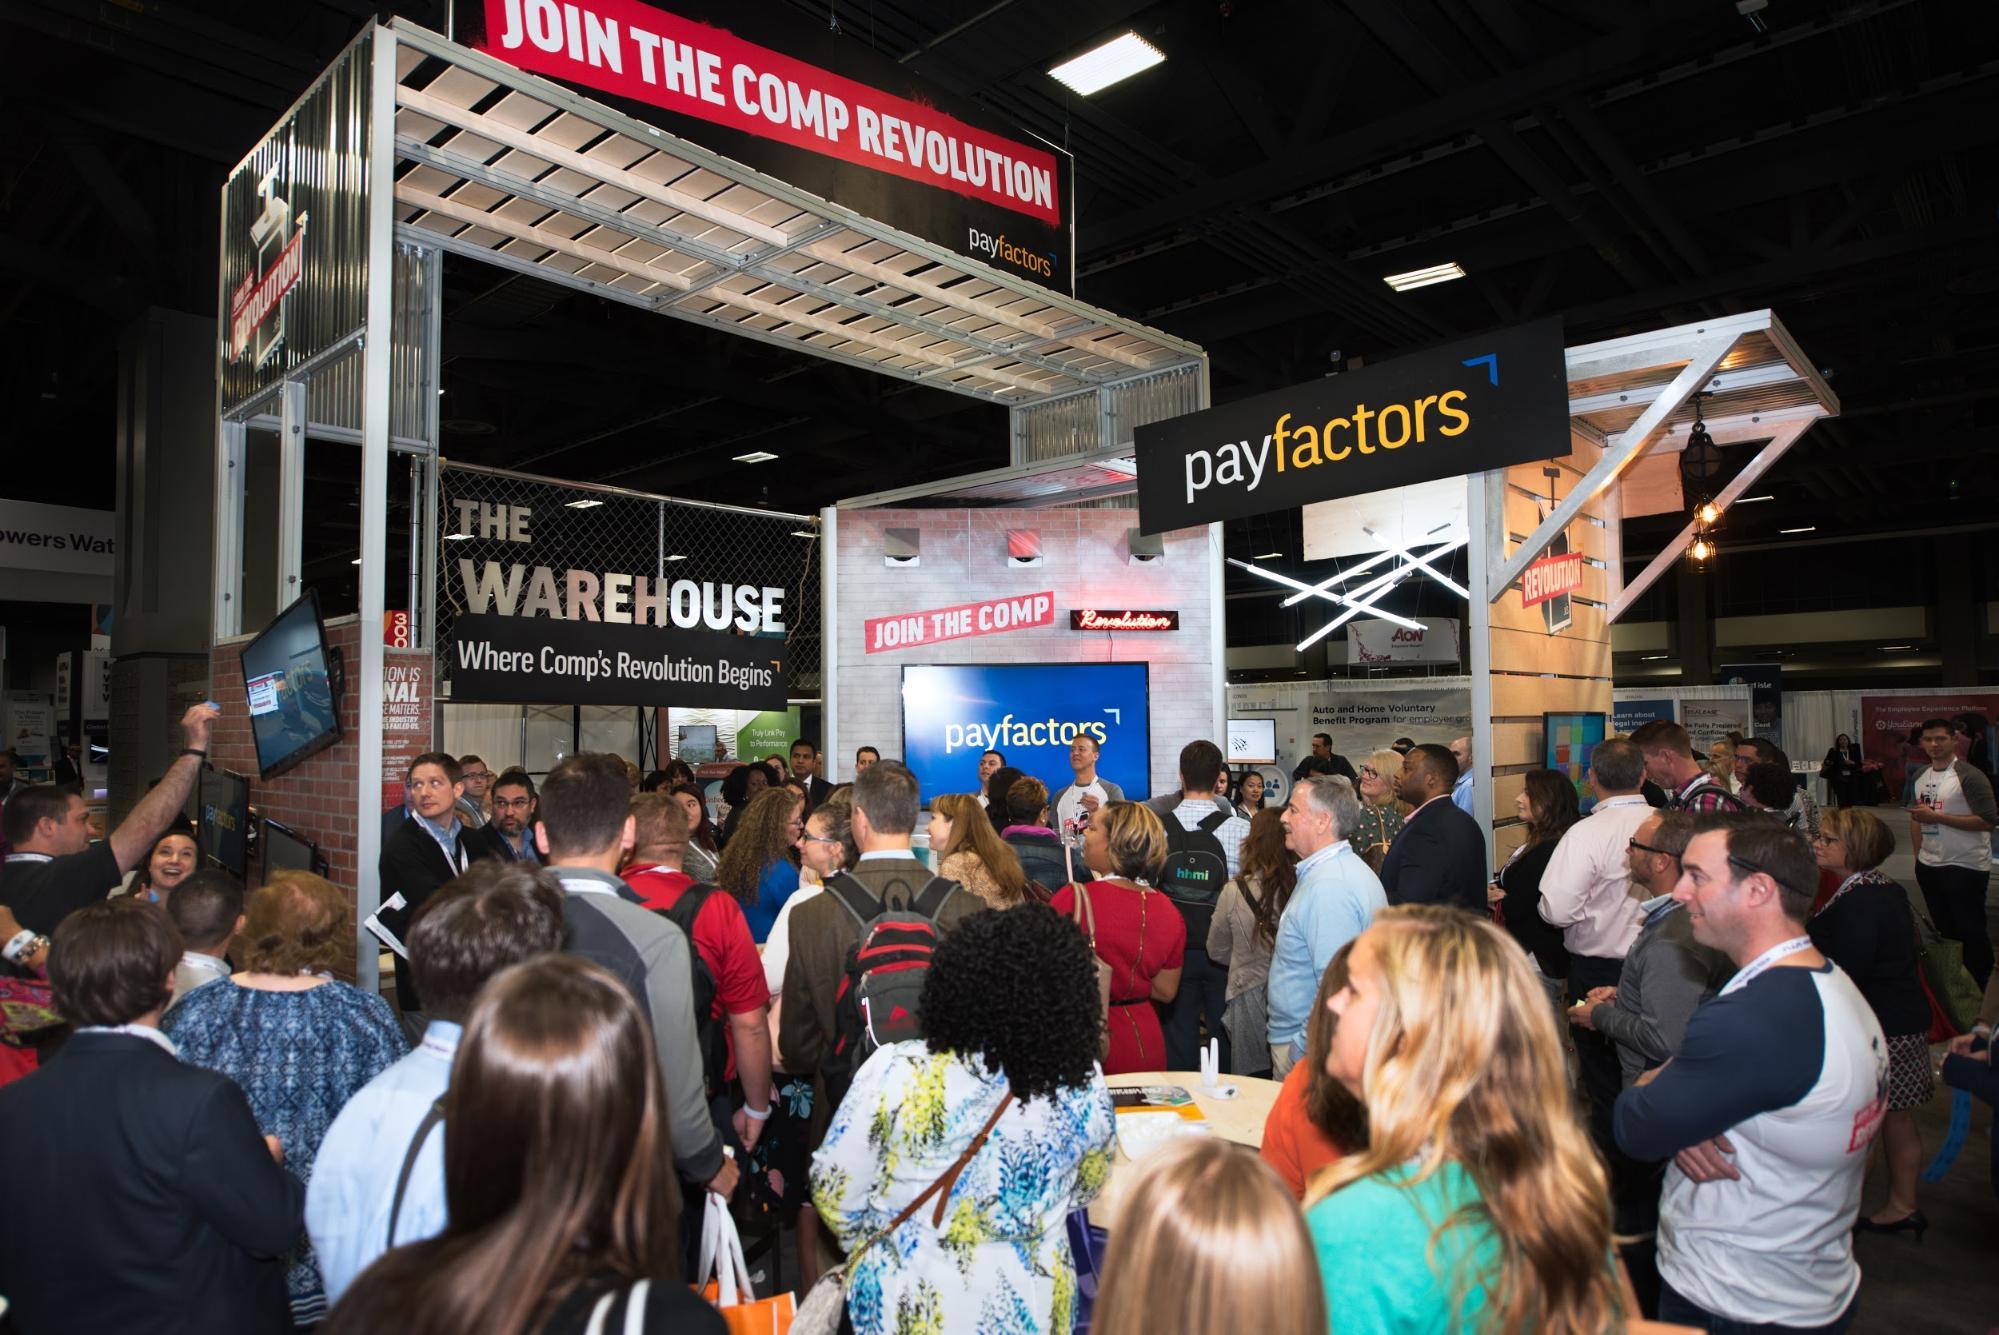 Crowded Payfactors exhibit